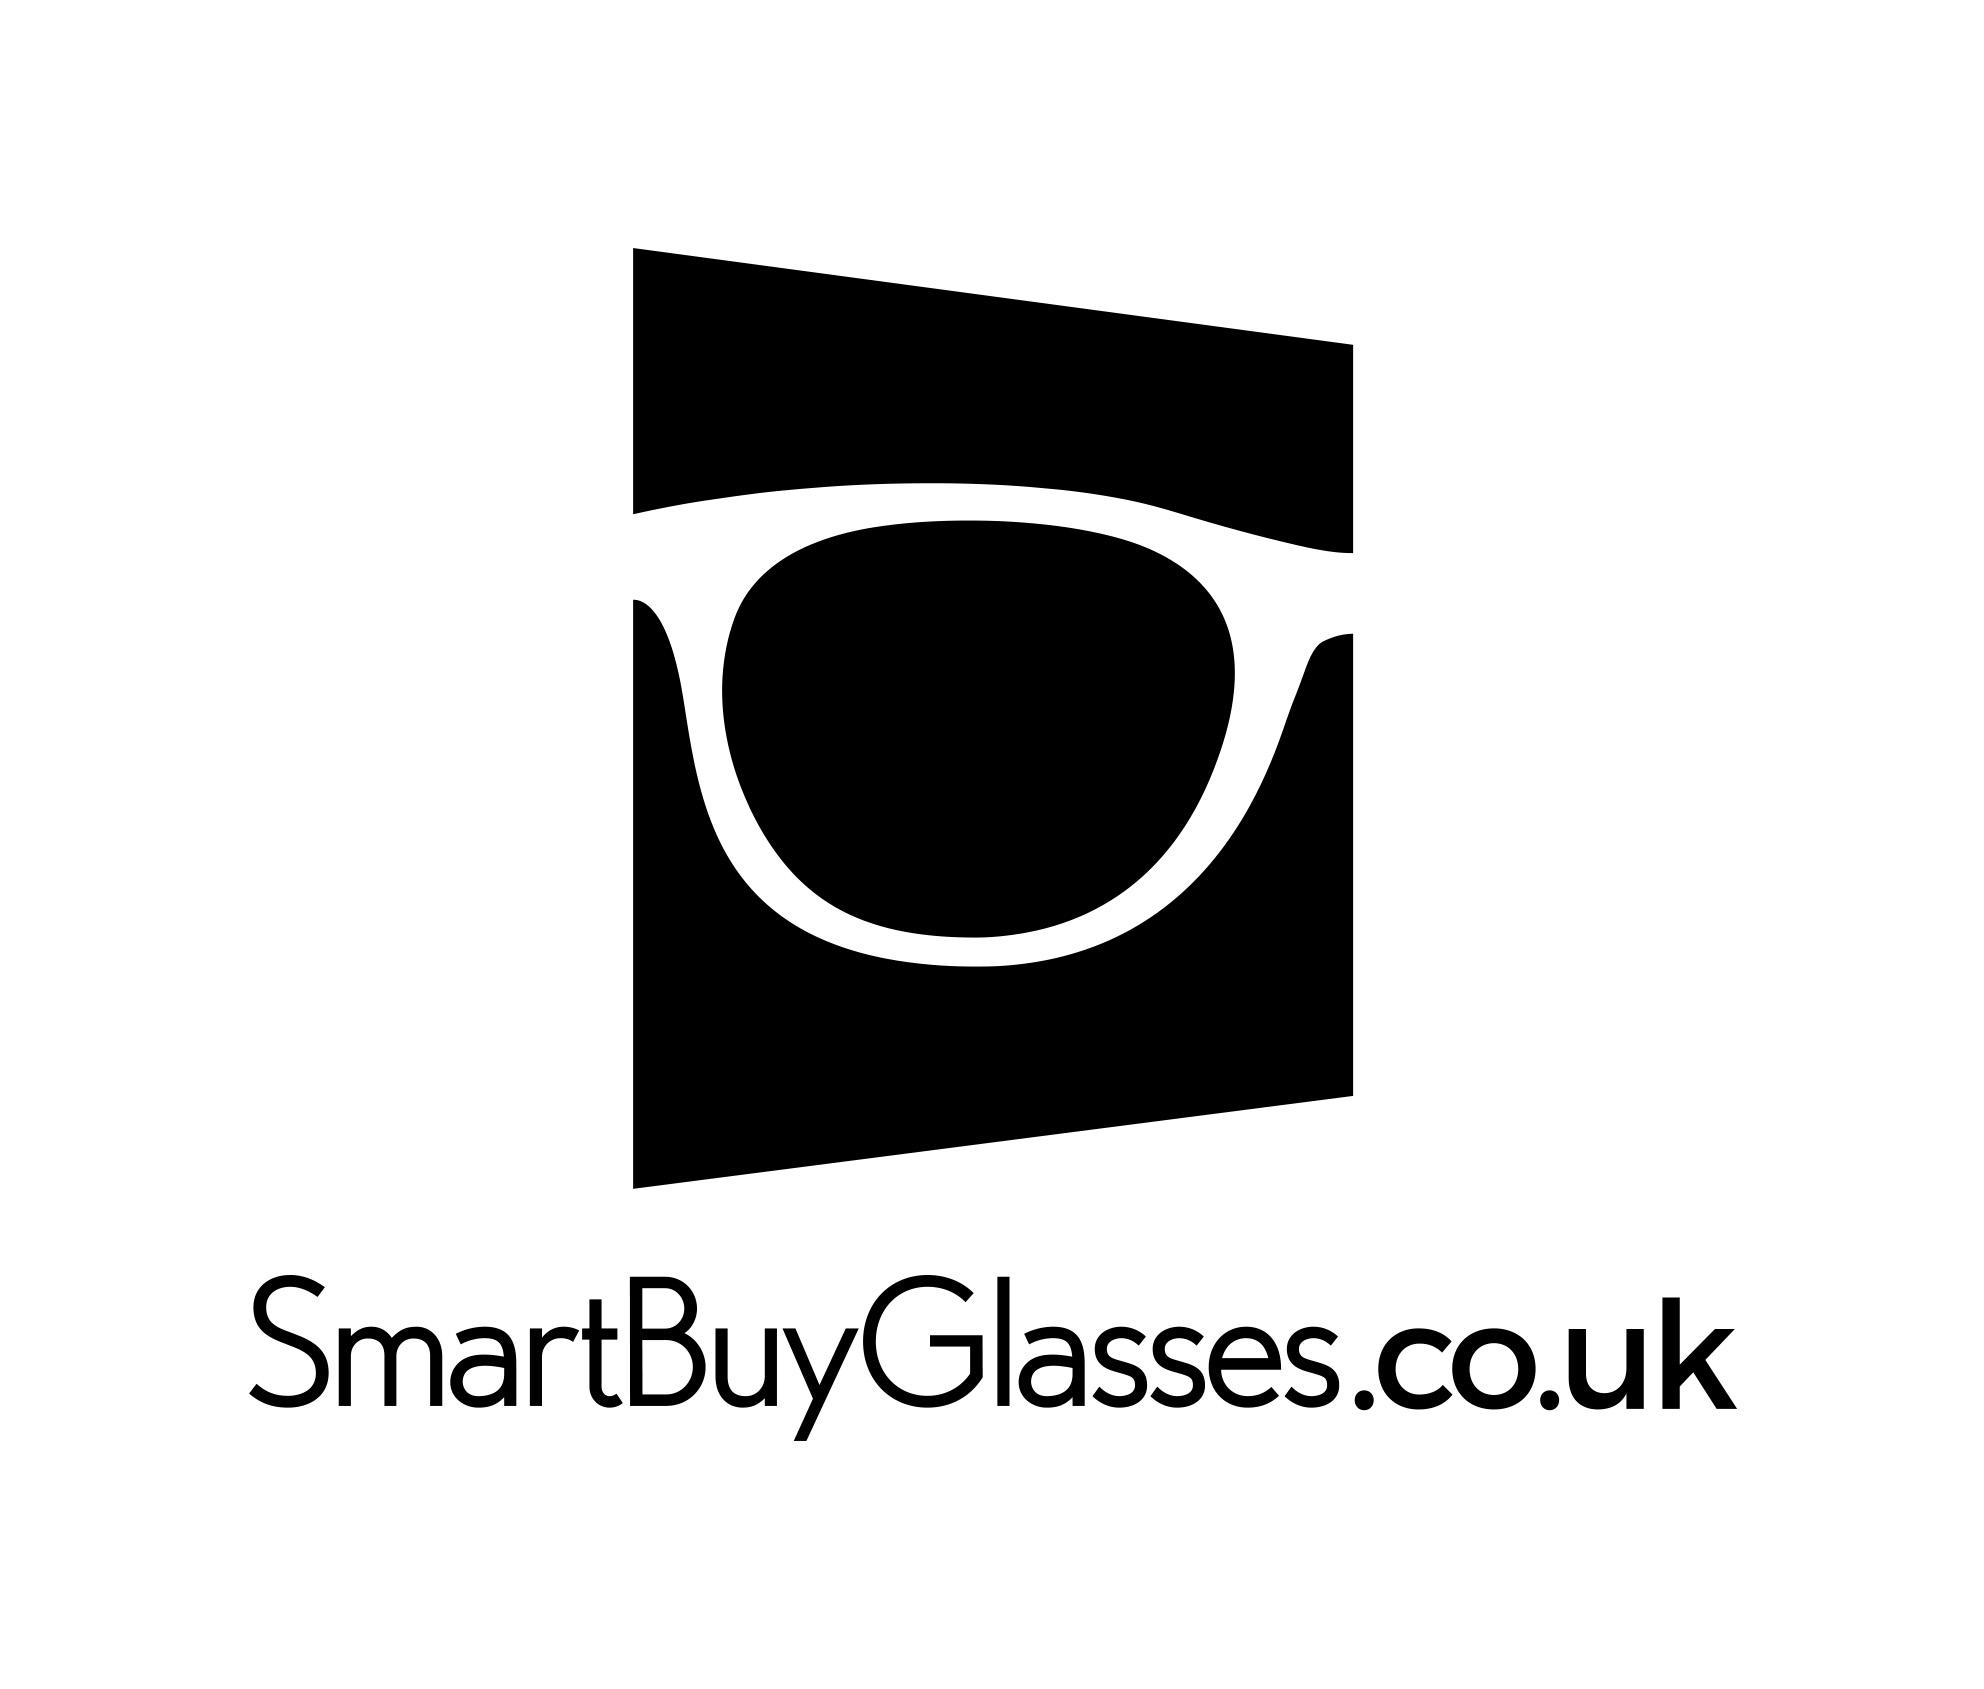 smartbuyglasses.co.uk logo